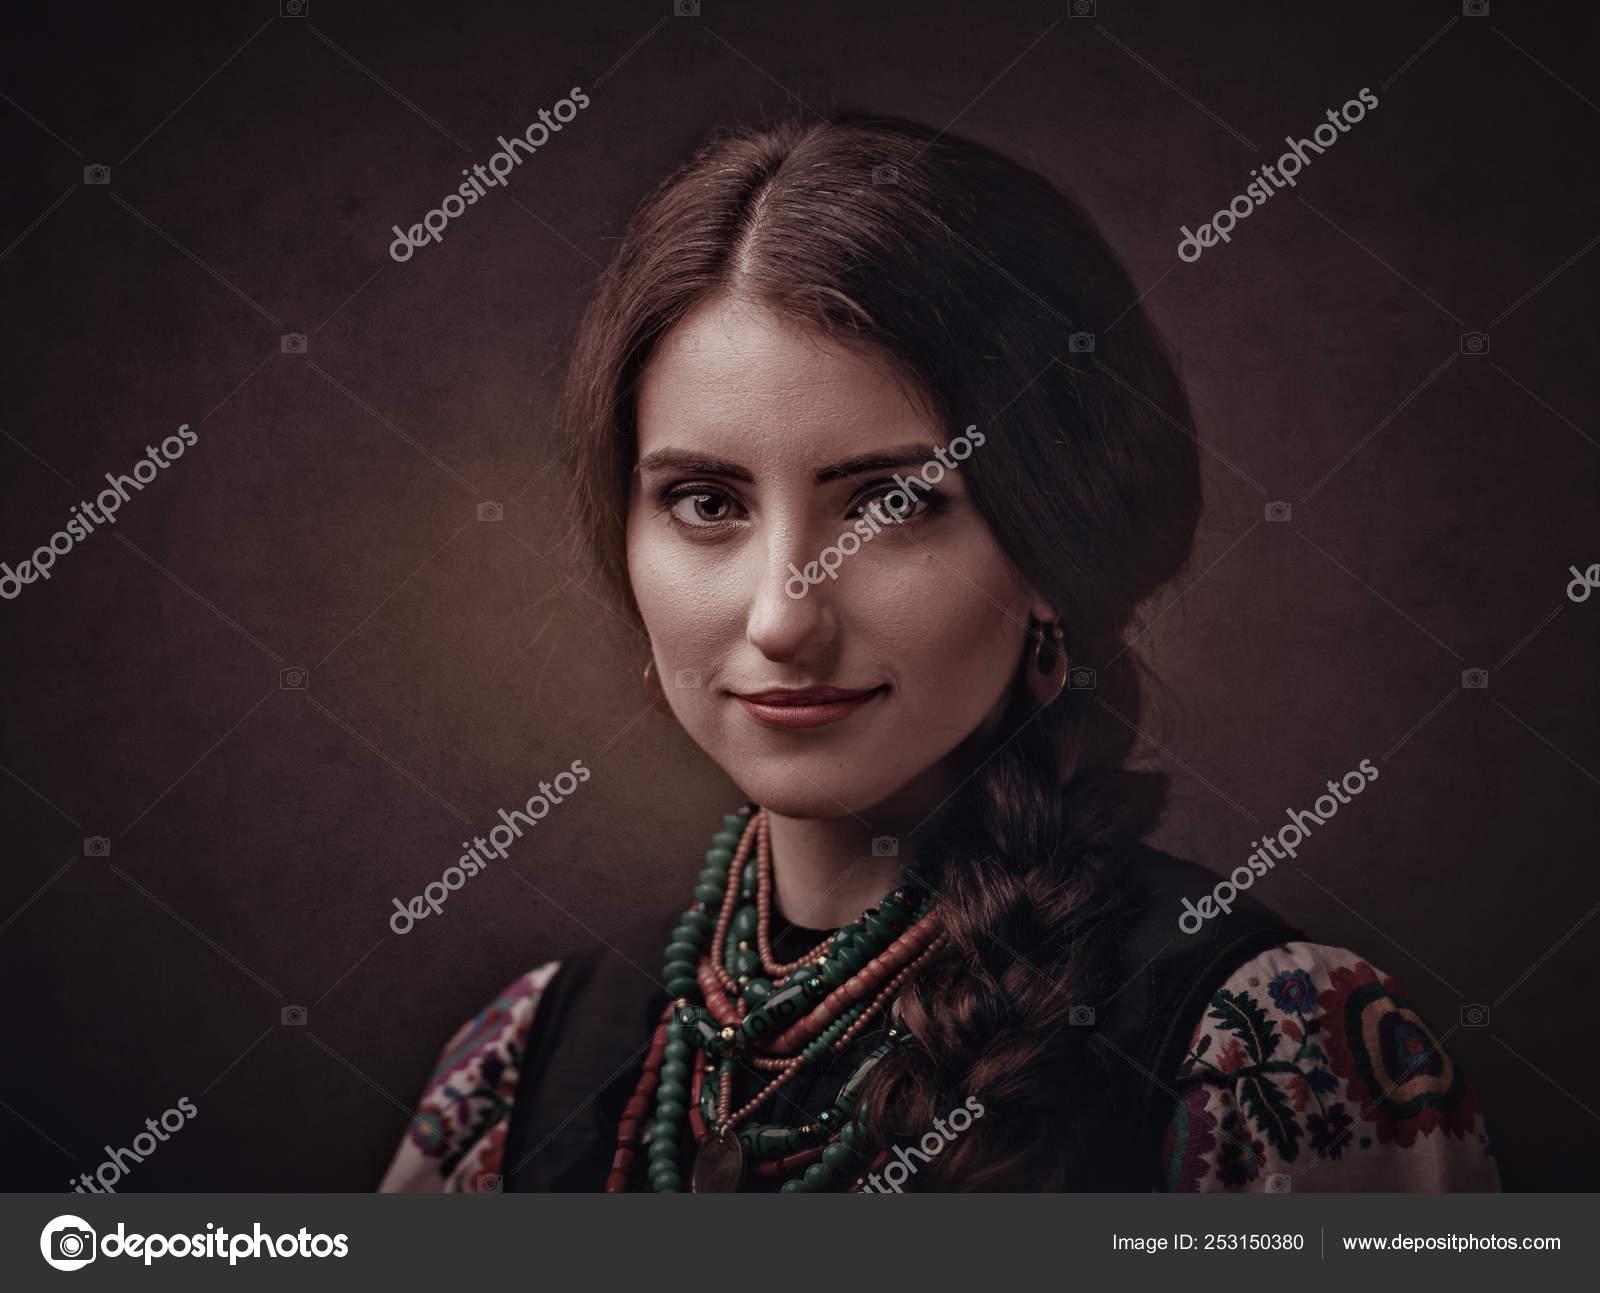 https://st4.depositphotos.com/1000123/25315/i/1600/depositphotos_253150380-stock-photo-beauty-female-portrait-ethnic-ukrainian.jpg